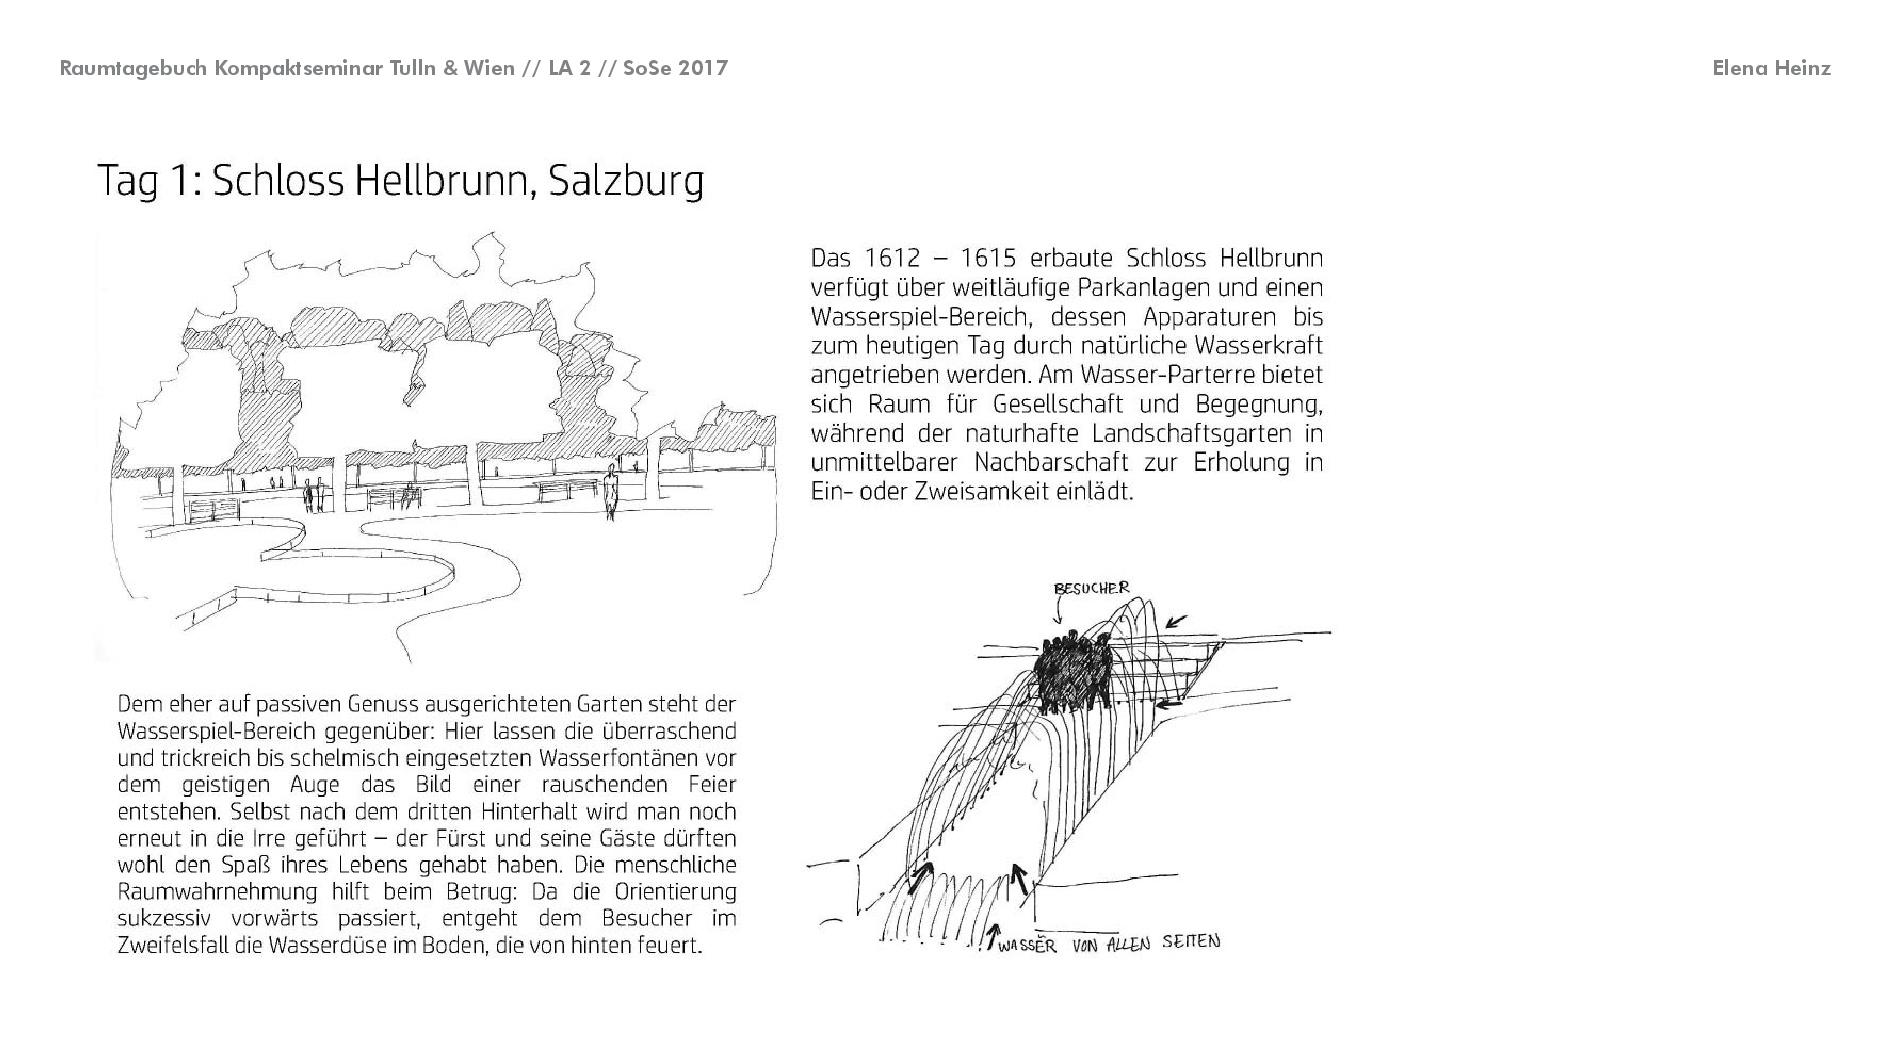 NEU Screen Raumtagebuch Tulln Wien SoSe 17 017